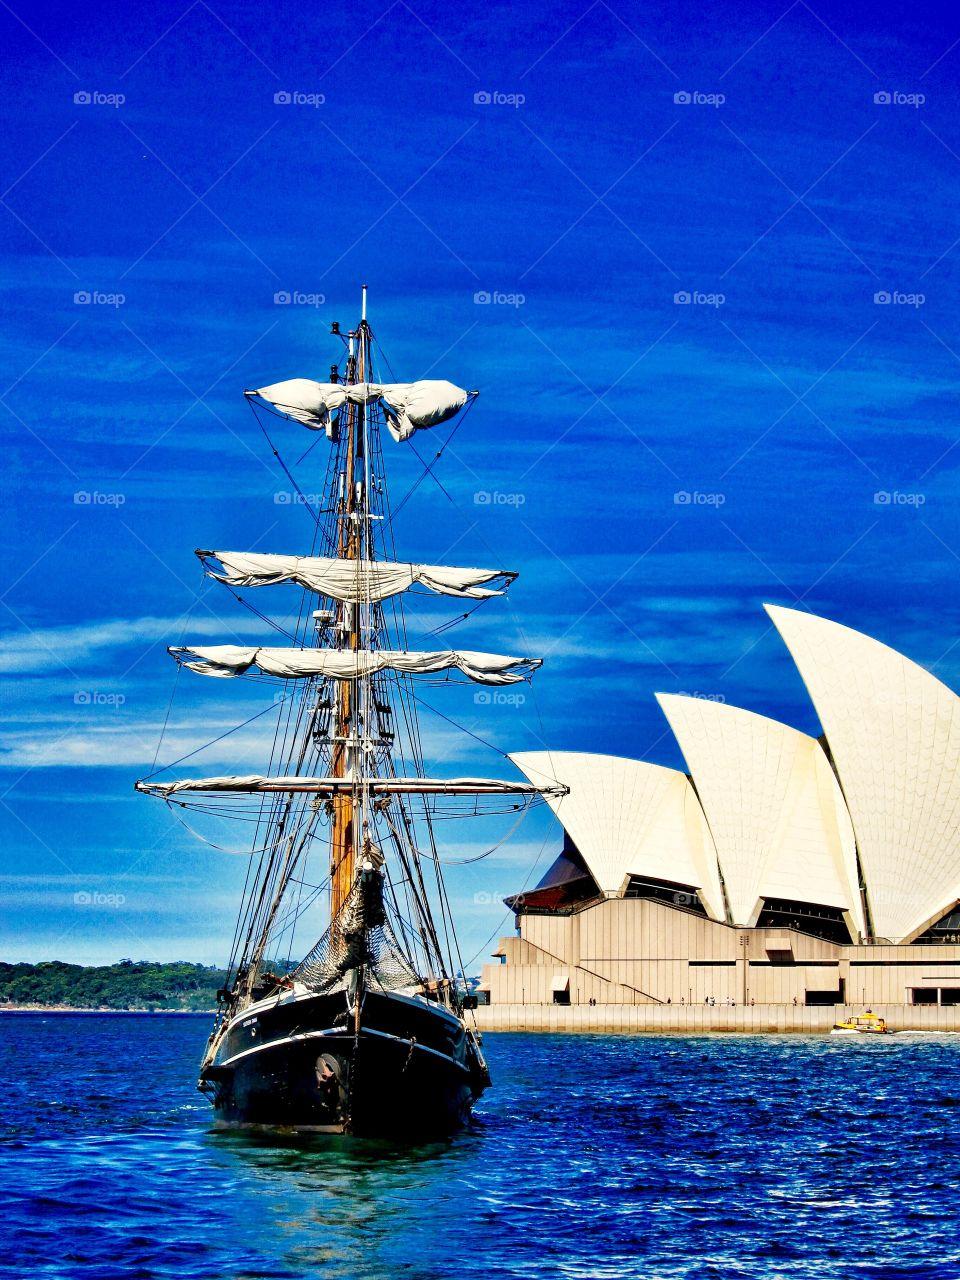 Sydney Opera House and a Tall Ship. Sydney Opera House and a Tall Ship